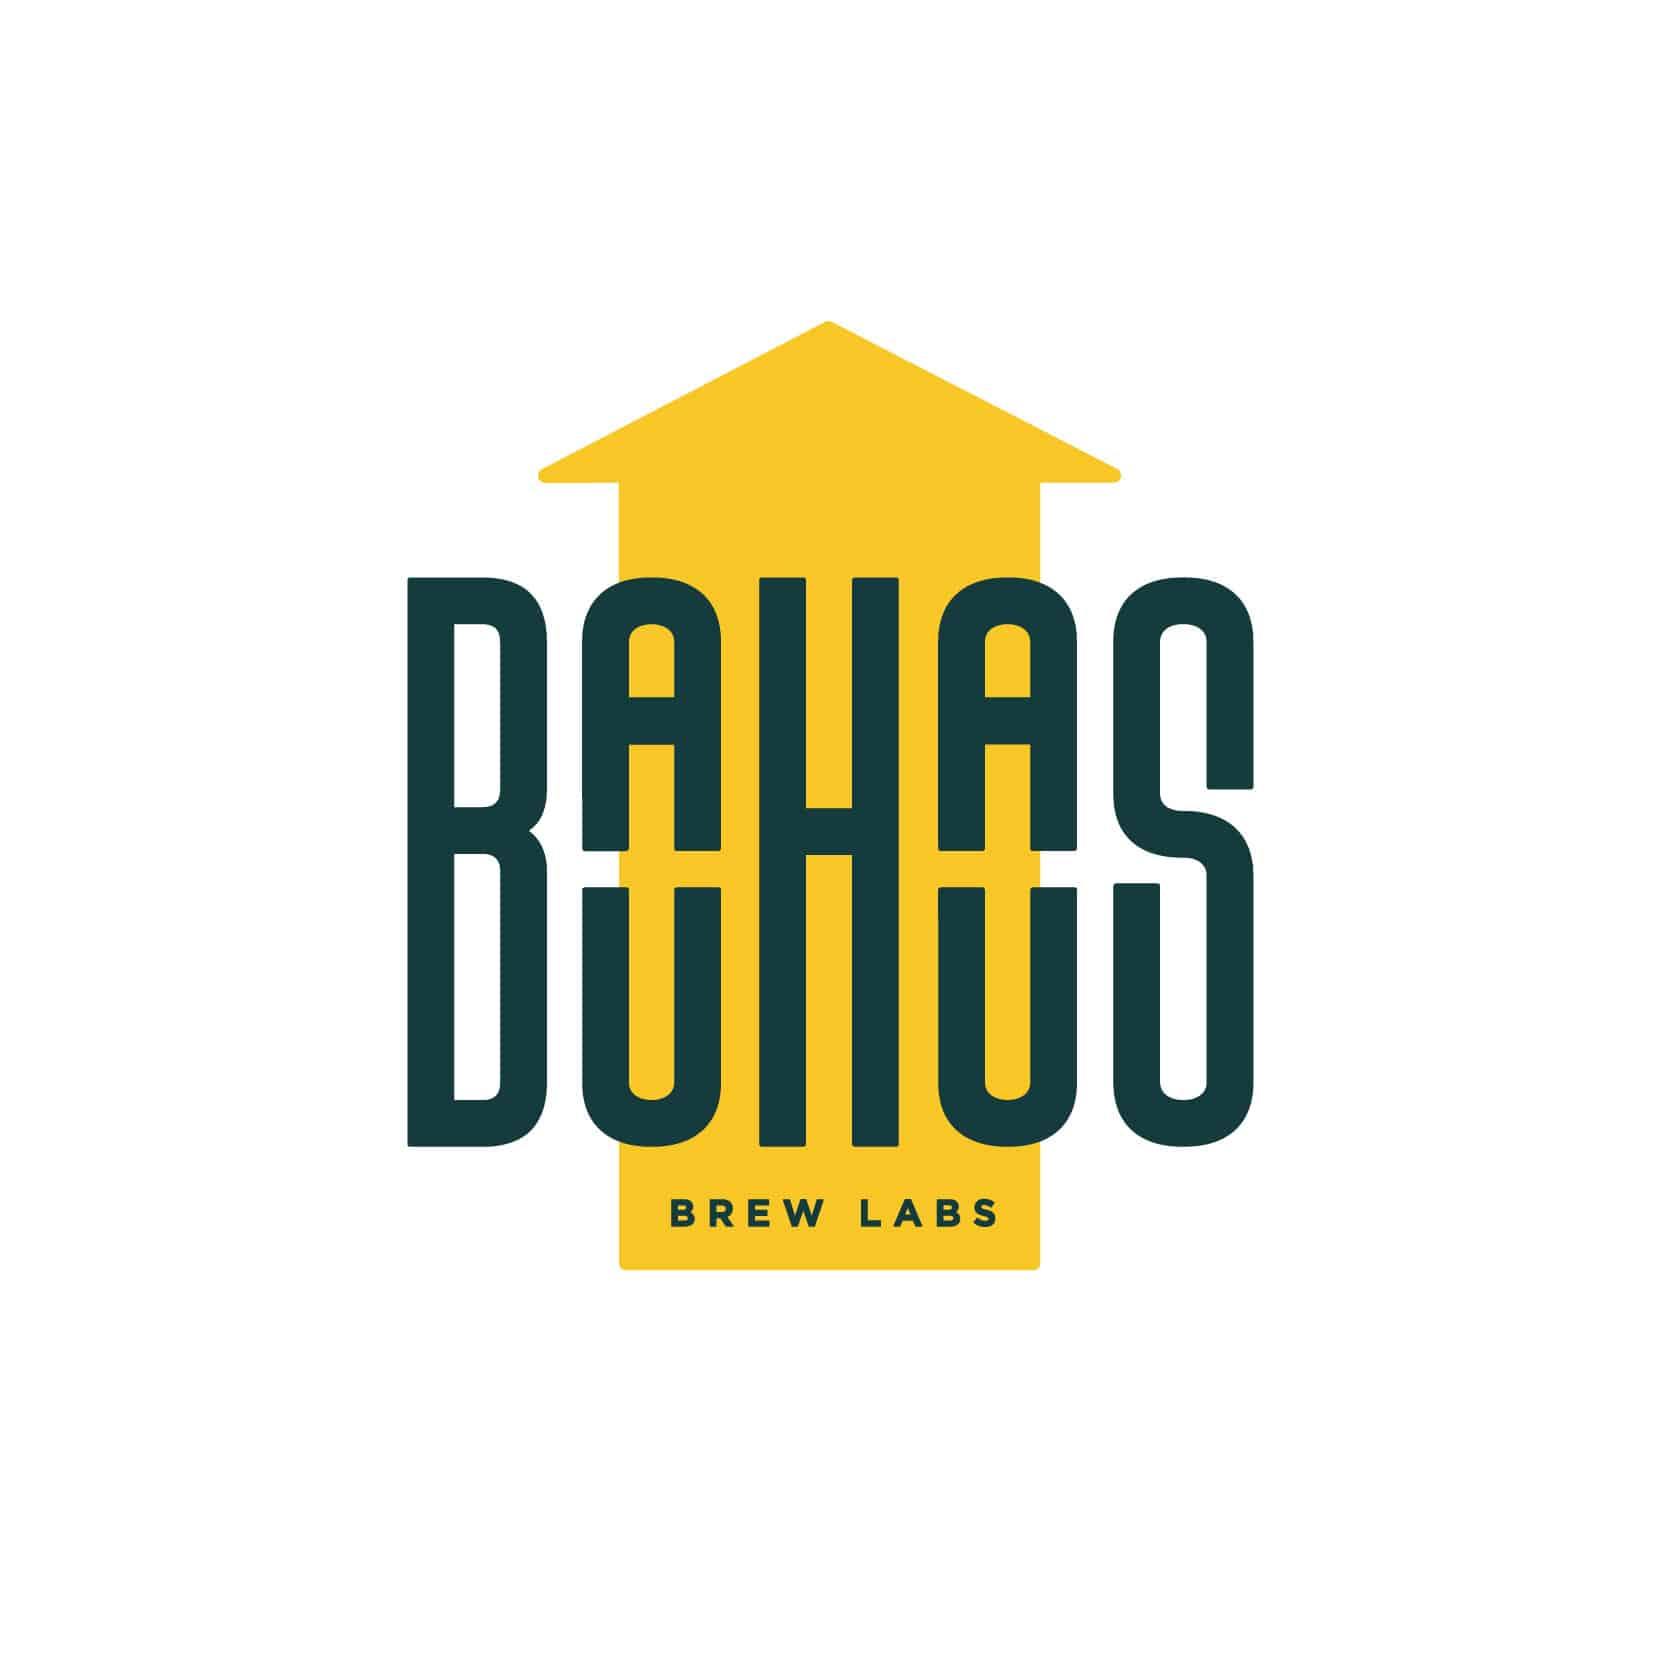 BauHuas Brew